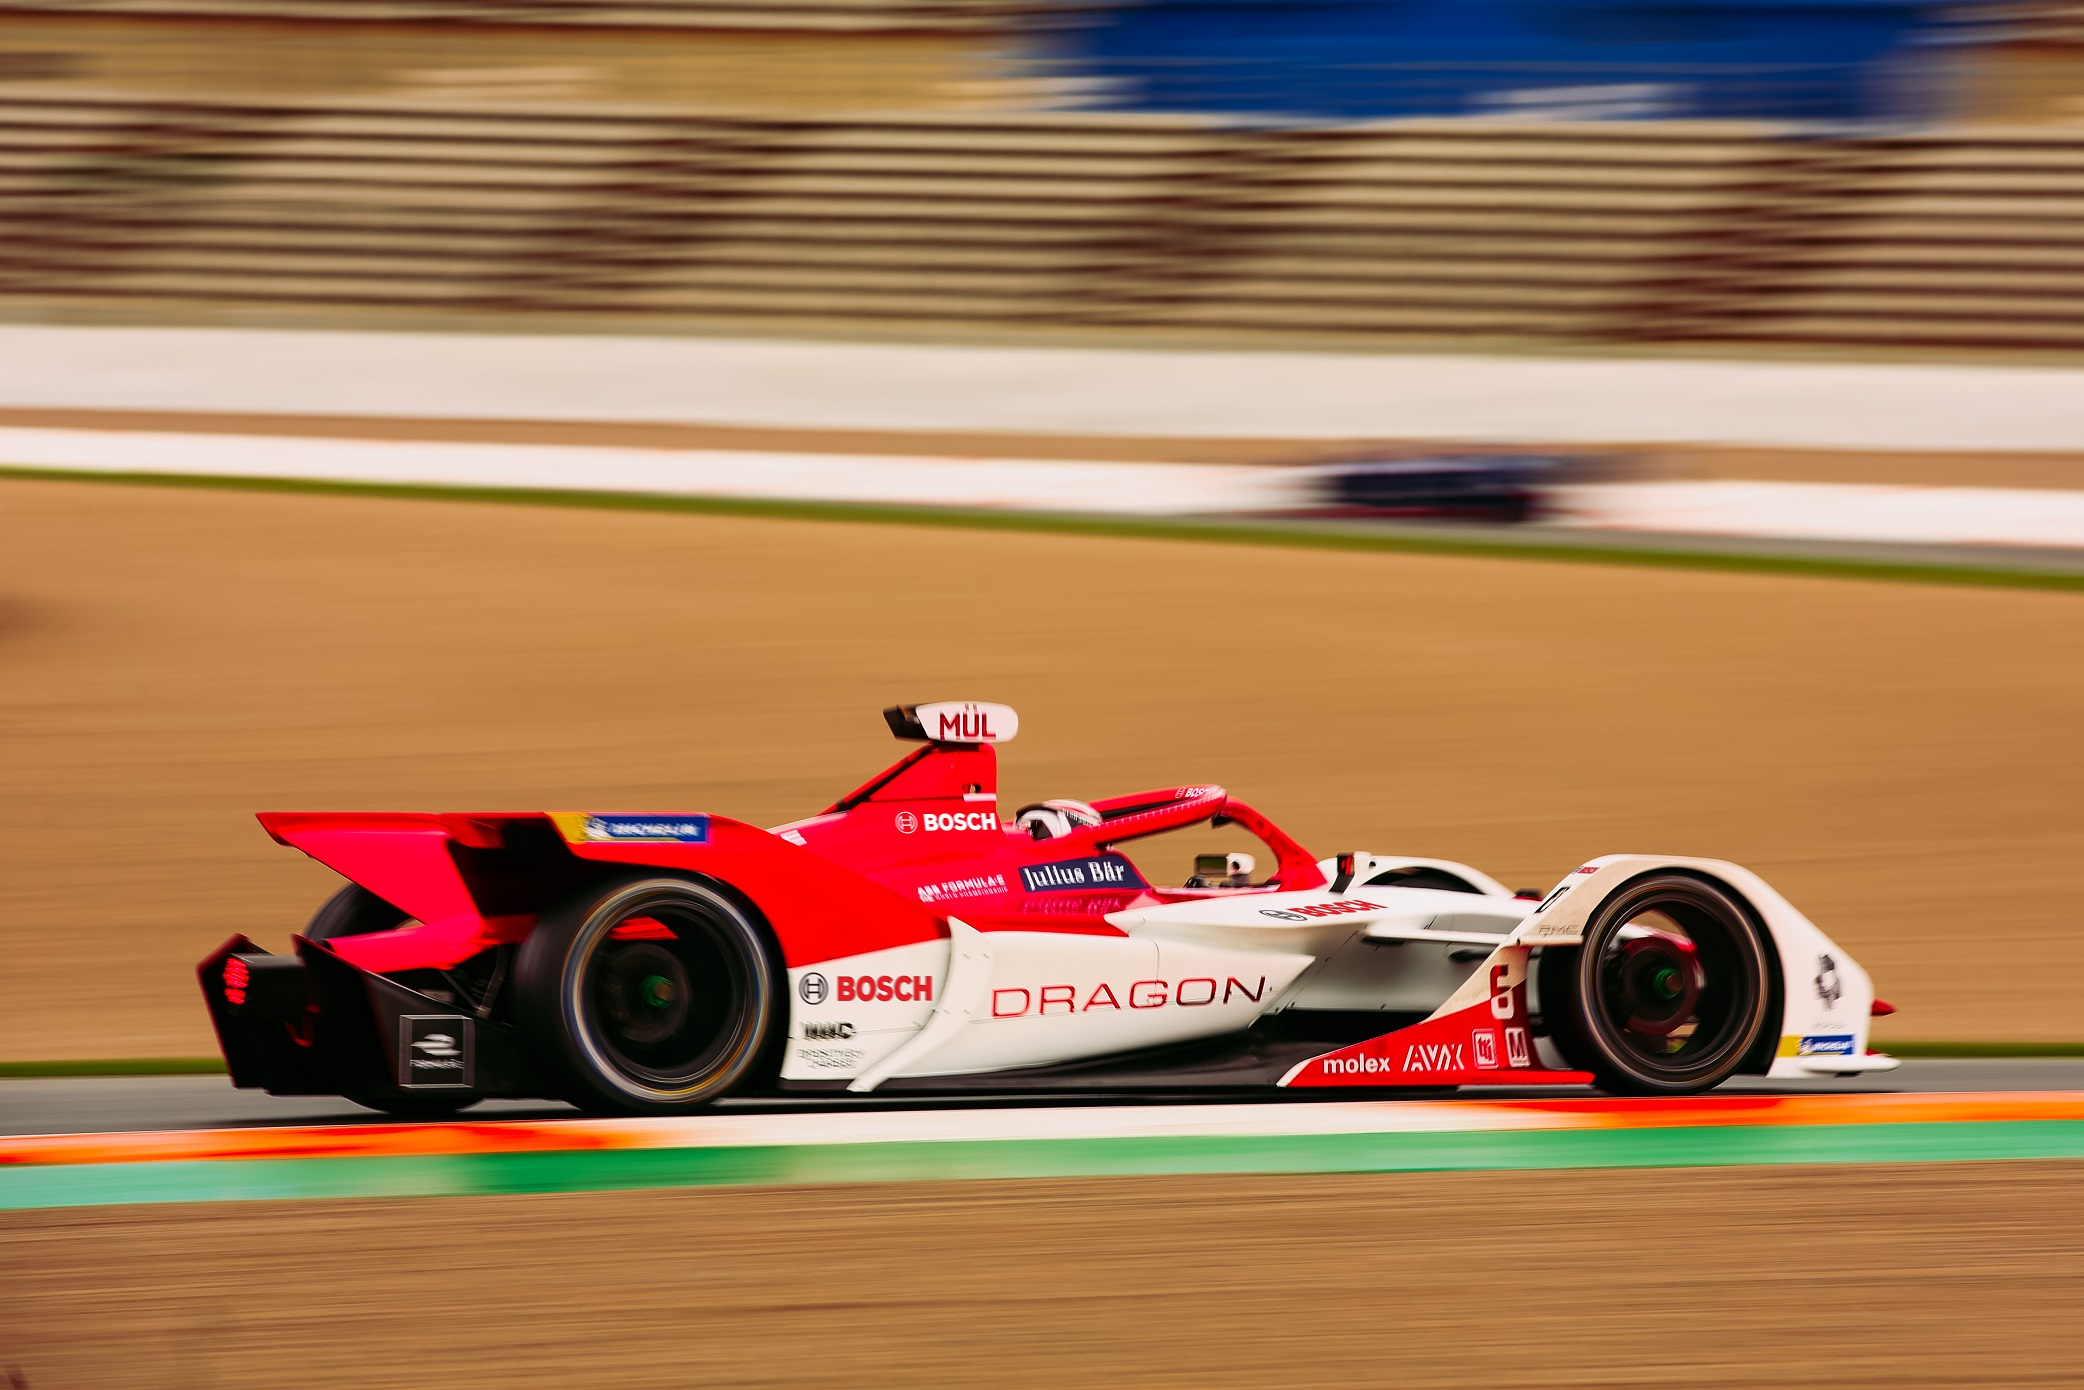 Bosch and DRAGON / PENSKE AUTOSPORT begin a long-term partnership in Formula E